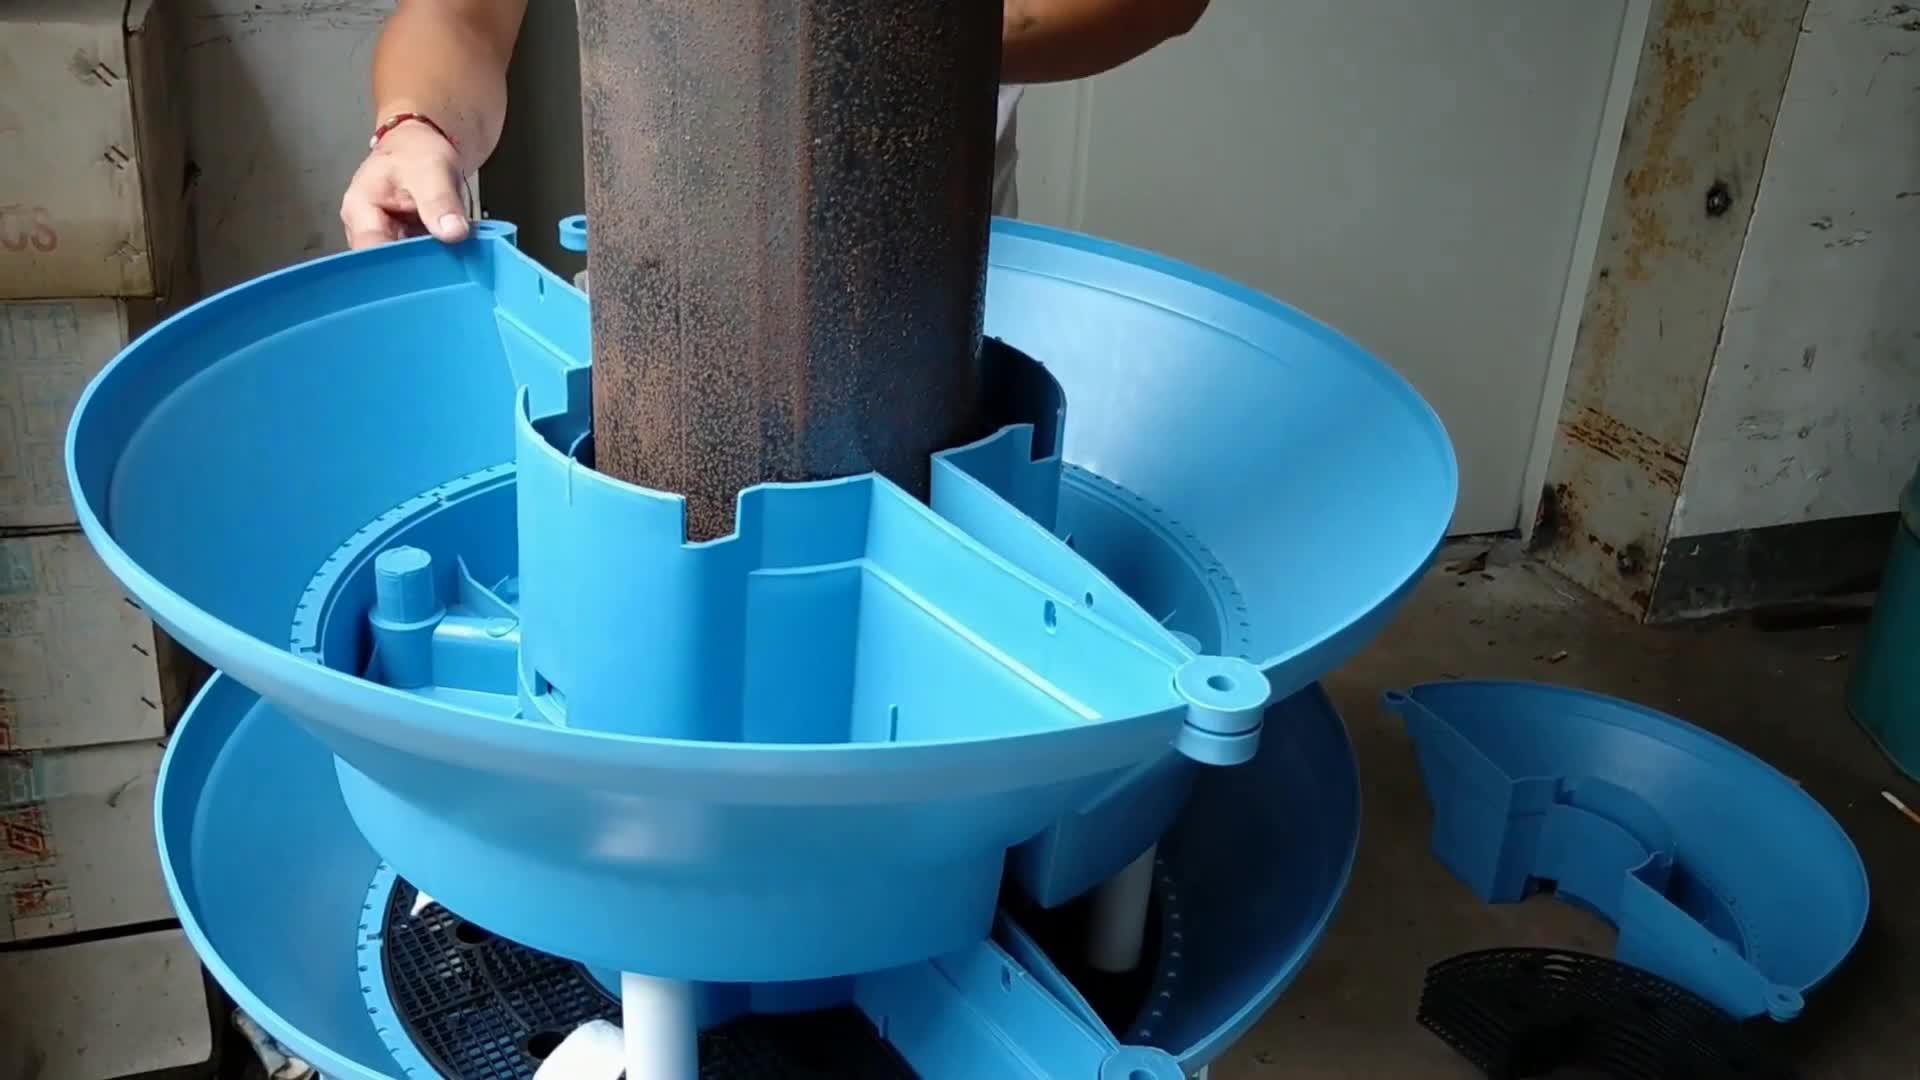 SOL Vertical Garden Pots Easily Assembled Round Flower Ball Planter Plastic Stackable Lamp Post Flower Pillar Self-Watering